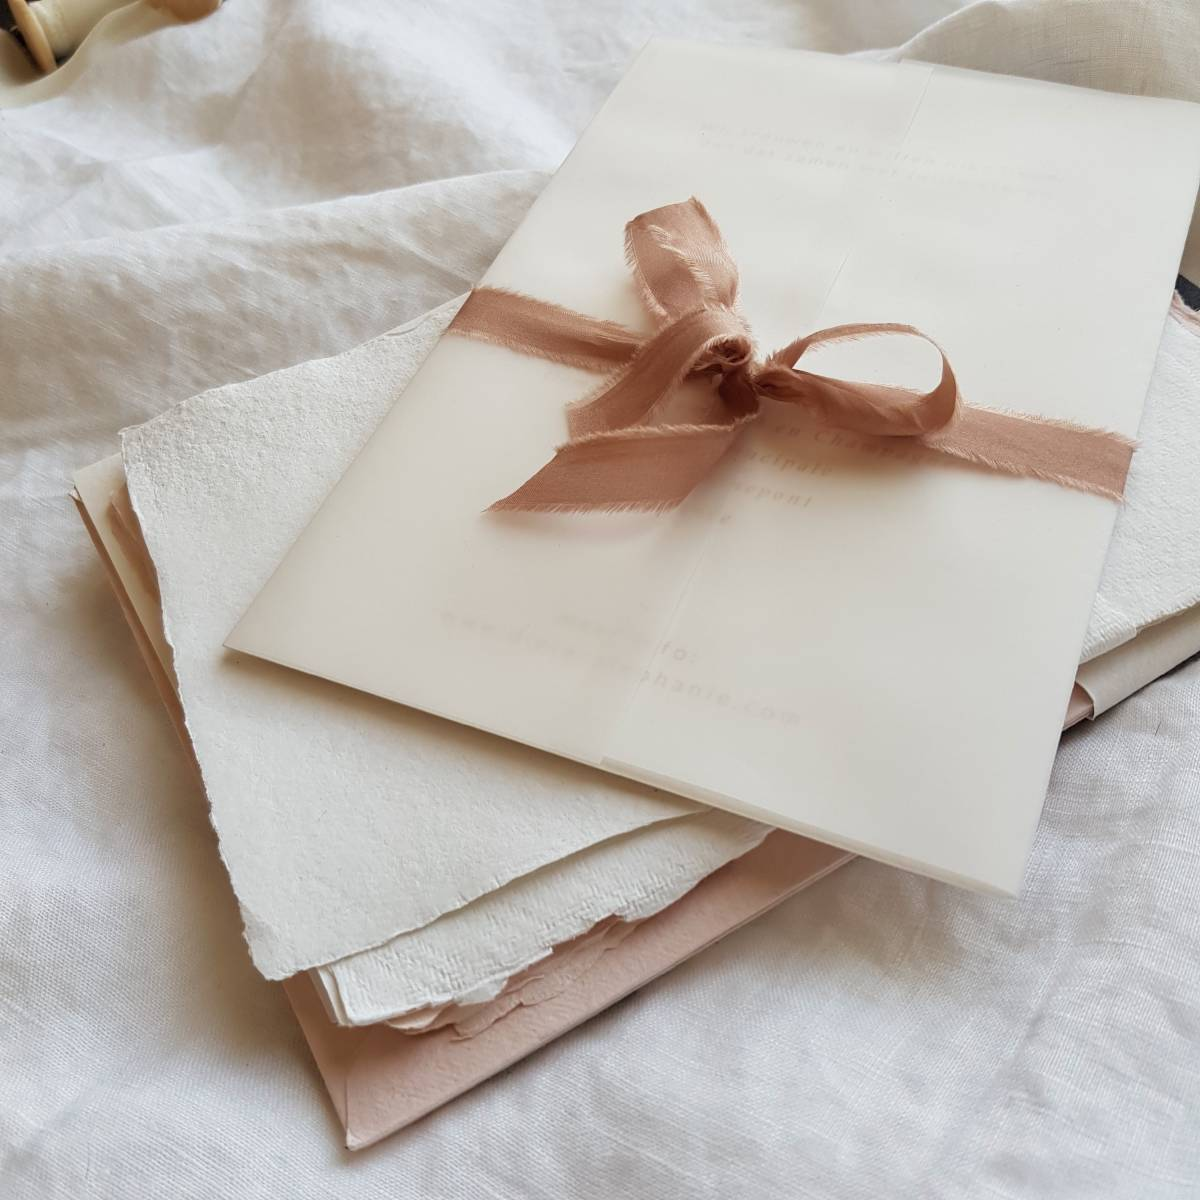 Touch of Gold - Trouwuitnodiging - Huwelijksuitnodiging - Kalligrafie - House of Weddings - 10